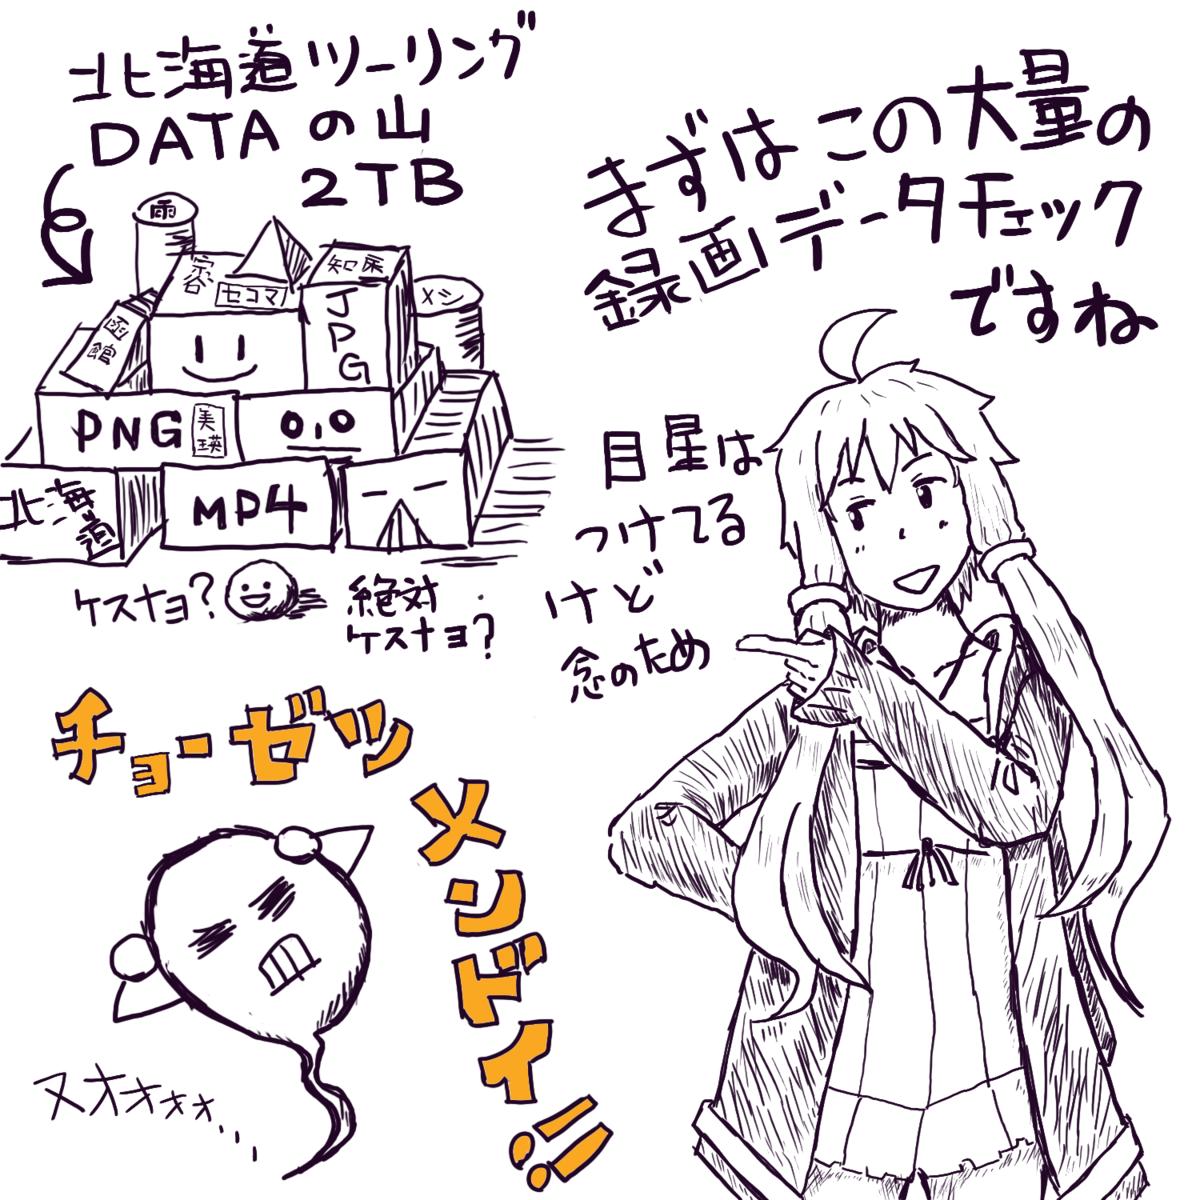 f:id:zomuzomu:20191107083544p:plain